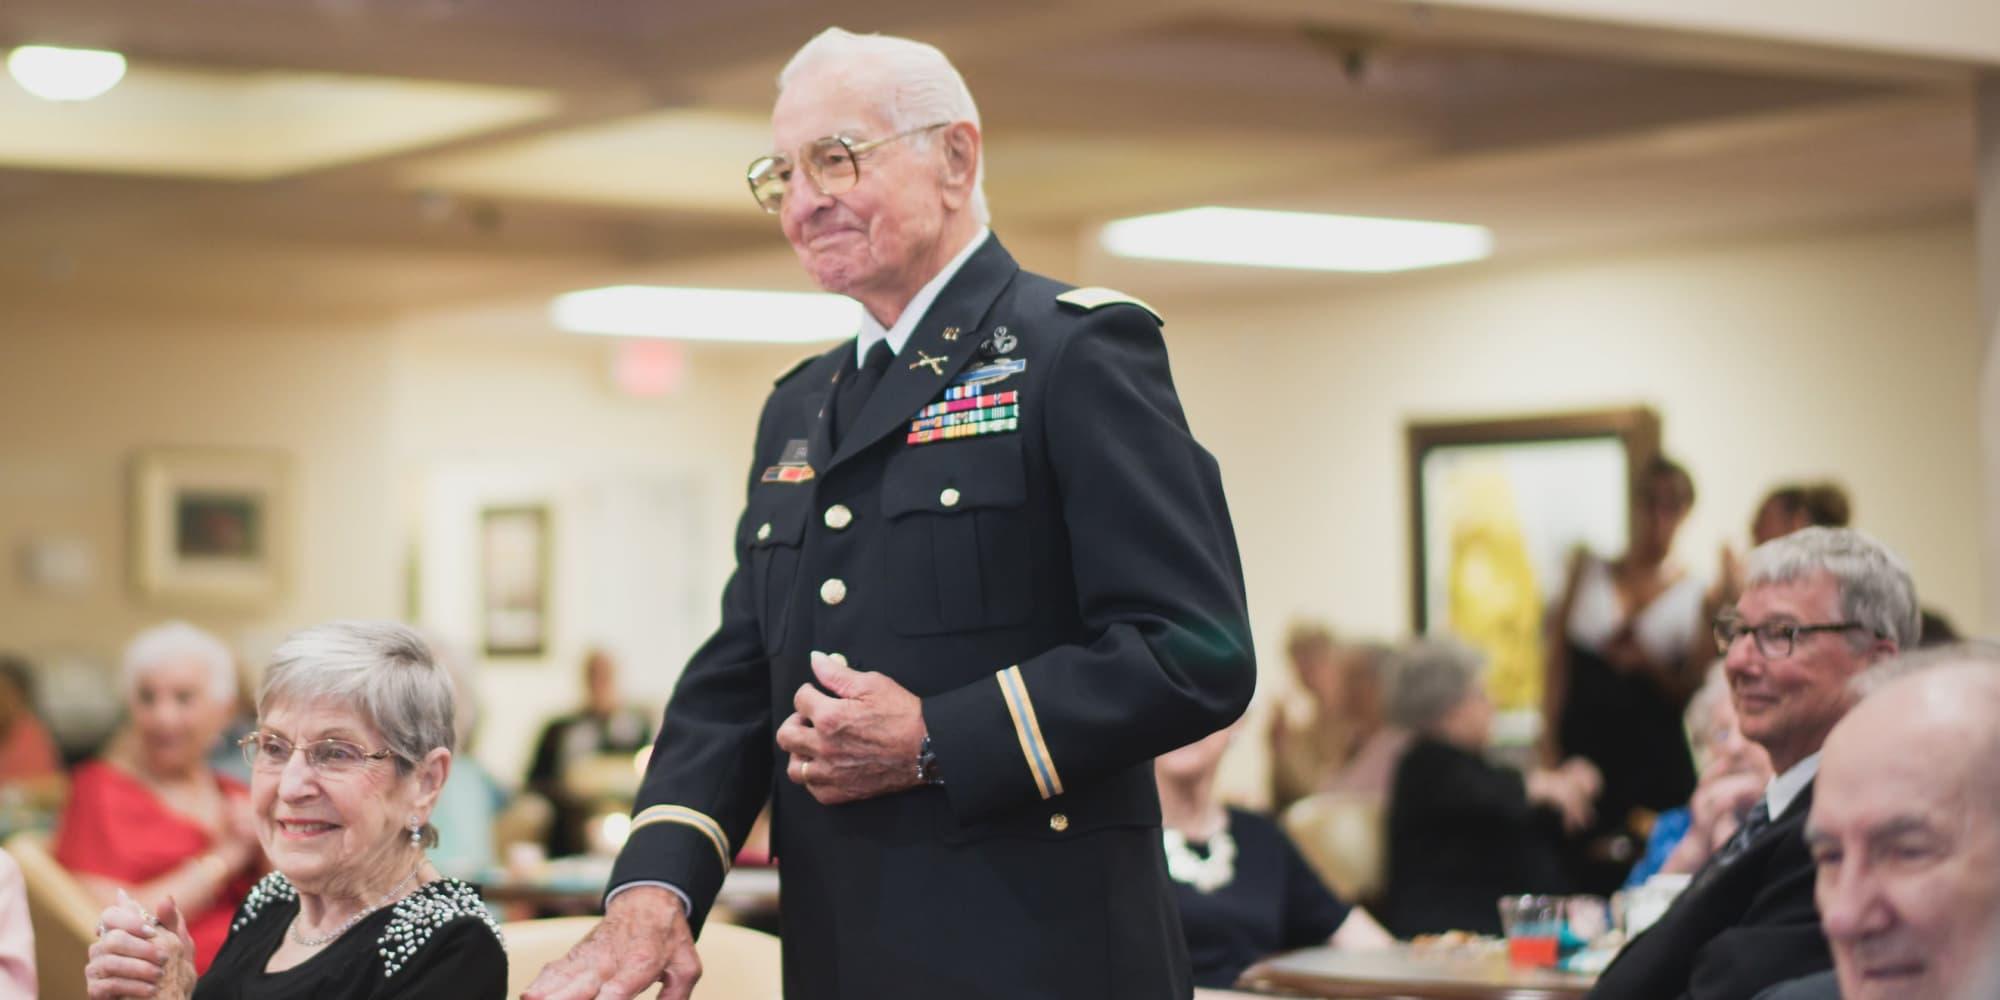 A veteran resident being recognized at Cottonwood Estates Gracious Retirement Living in Alpharetta, Georgia